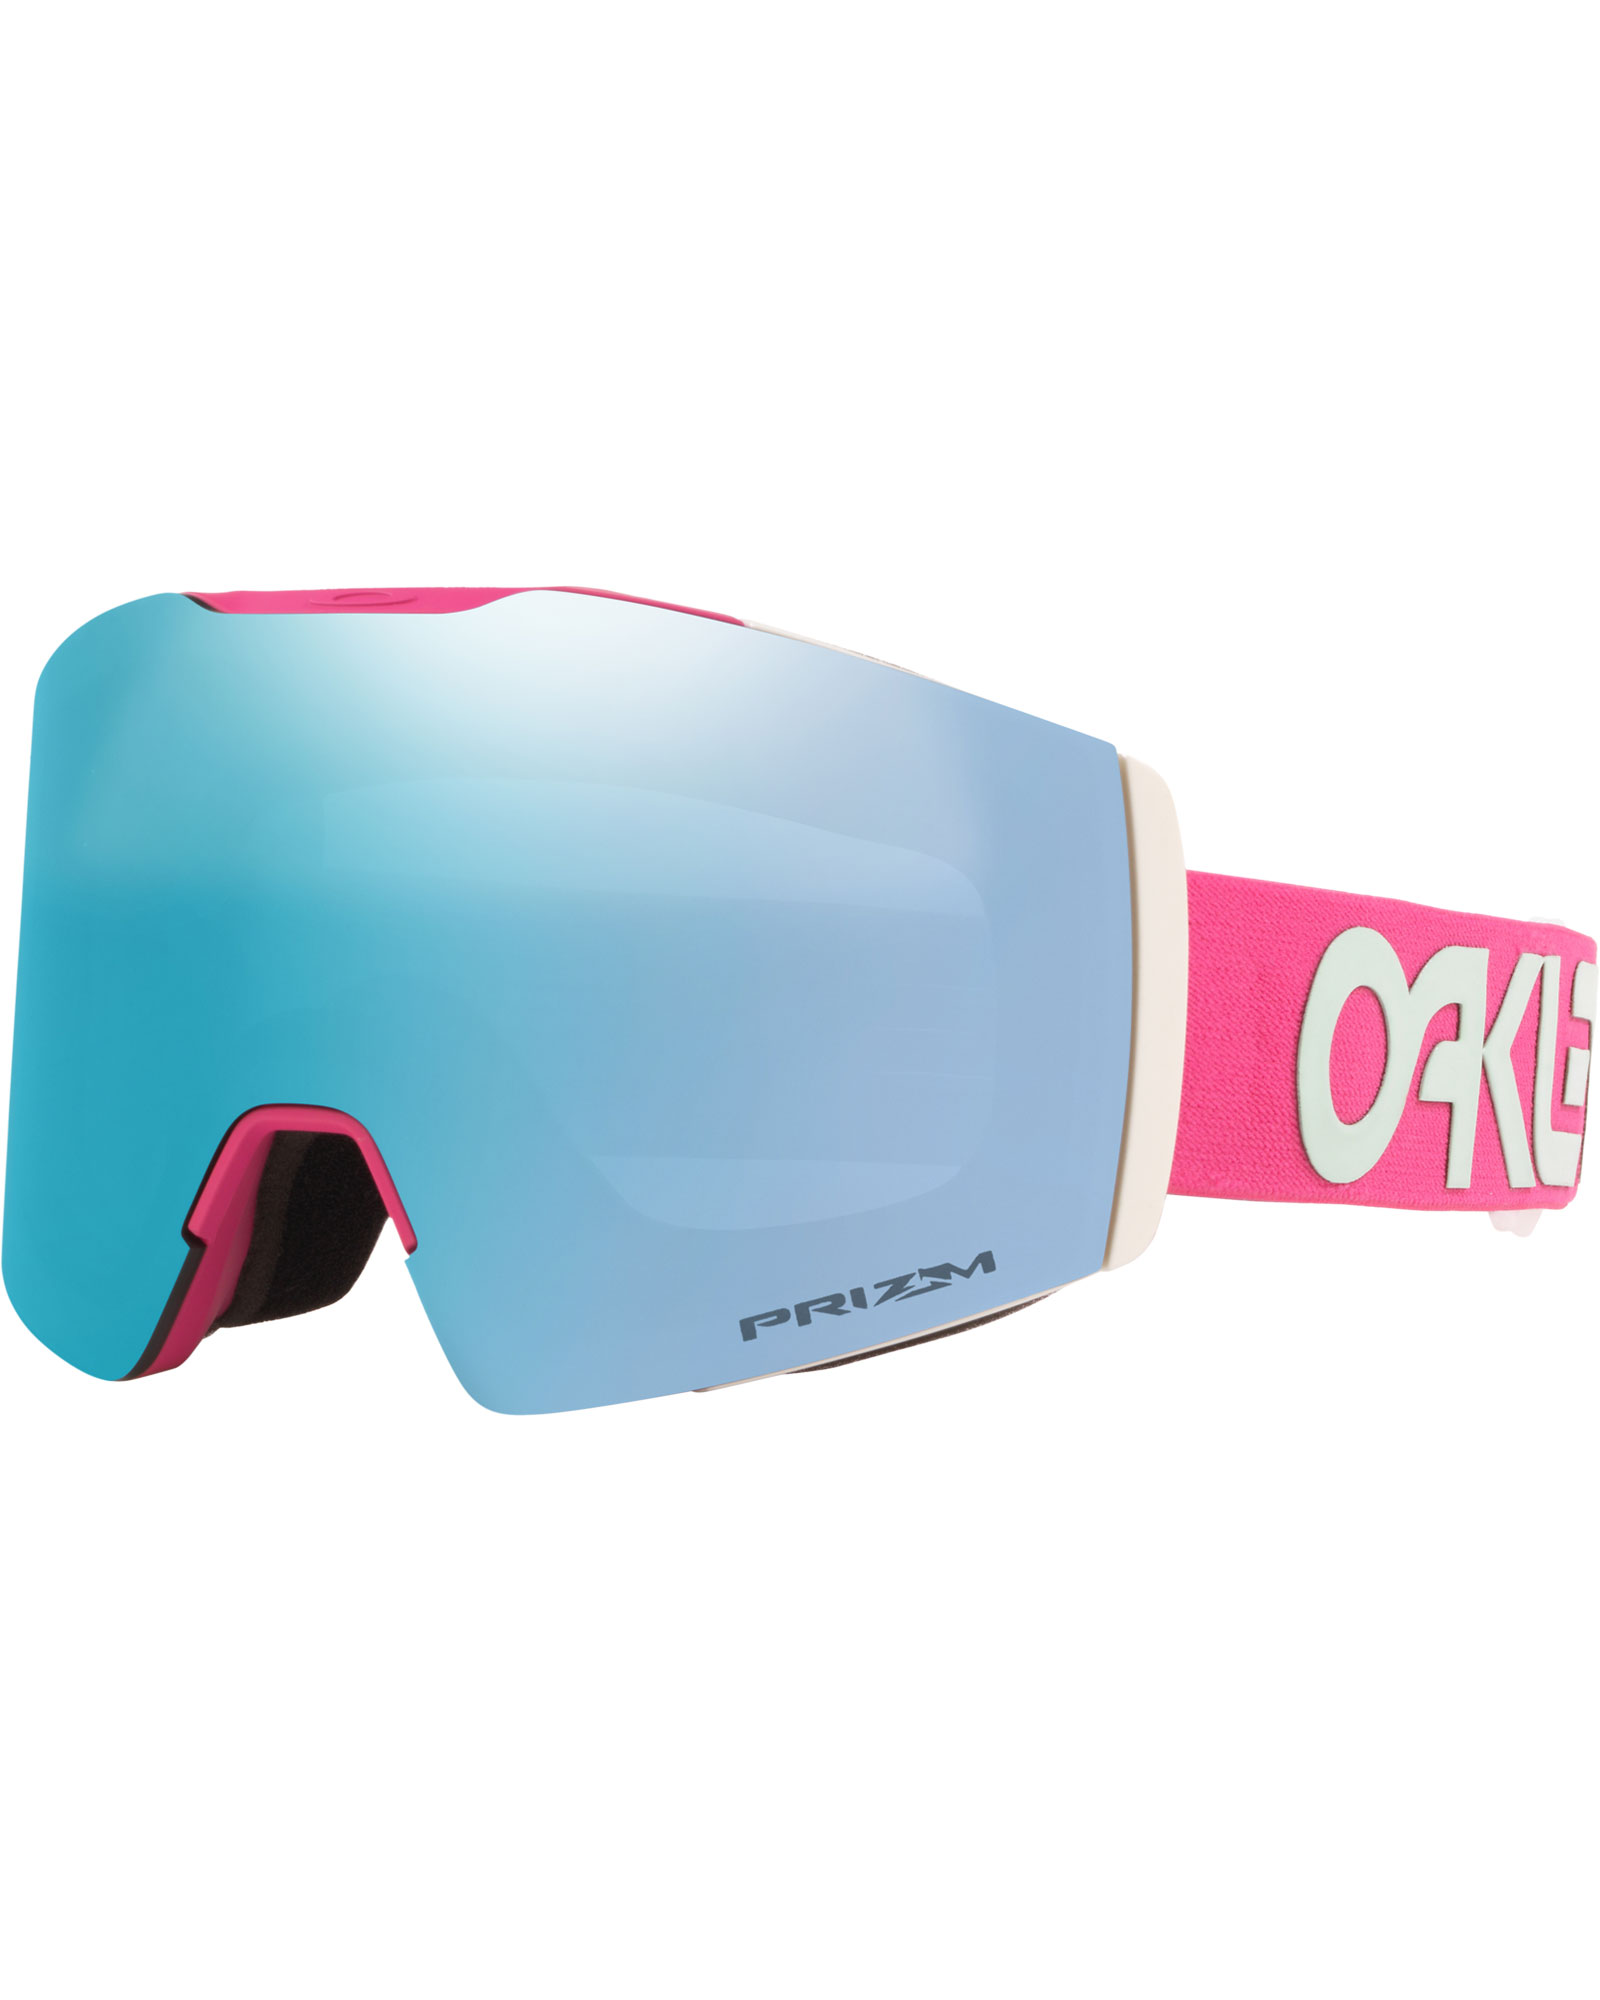 Oakley Fall Line XM Factory Pilot Rubine Jasmine / Prizm Sapphire Iridium Goggles 2020 / 2021 0